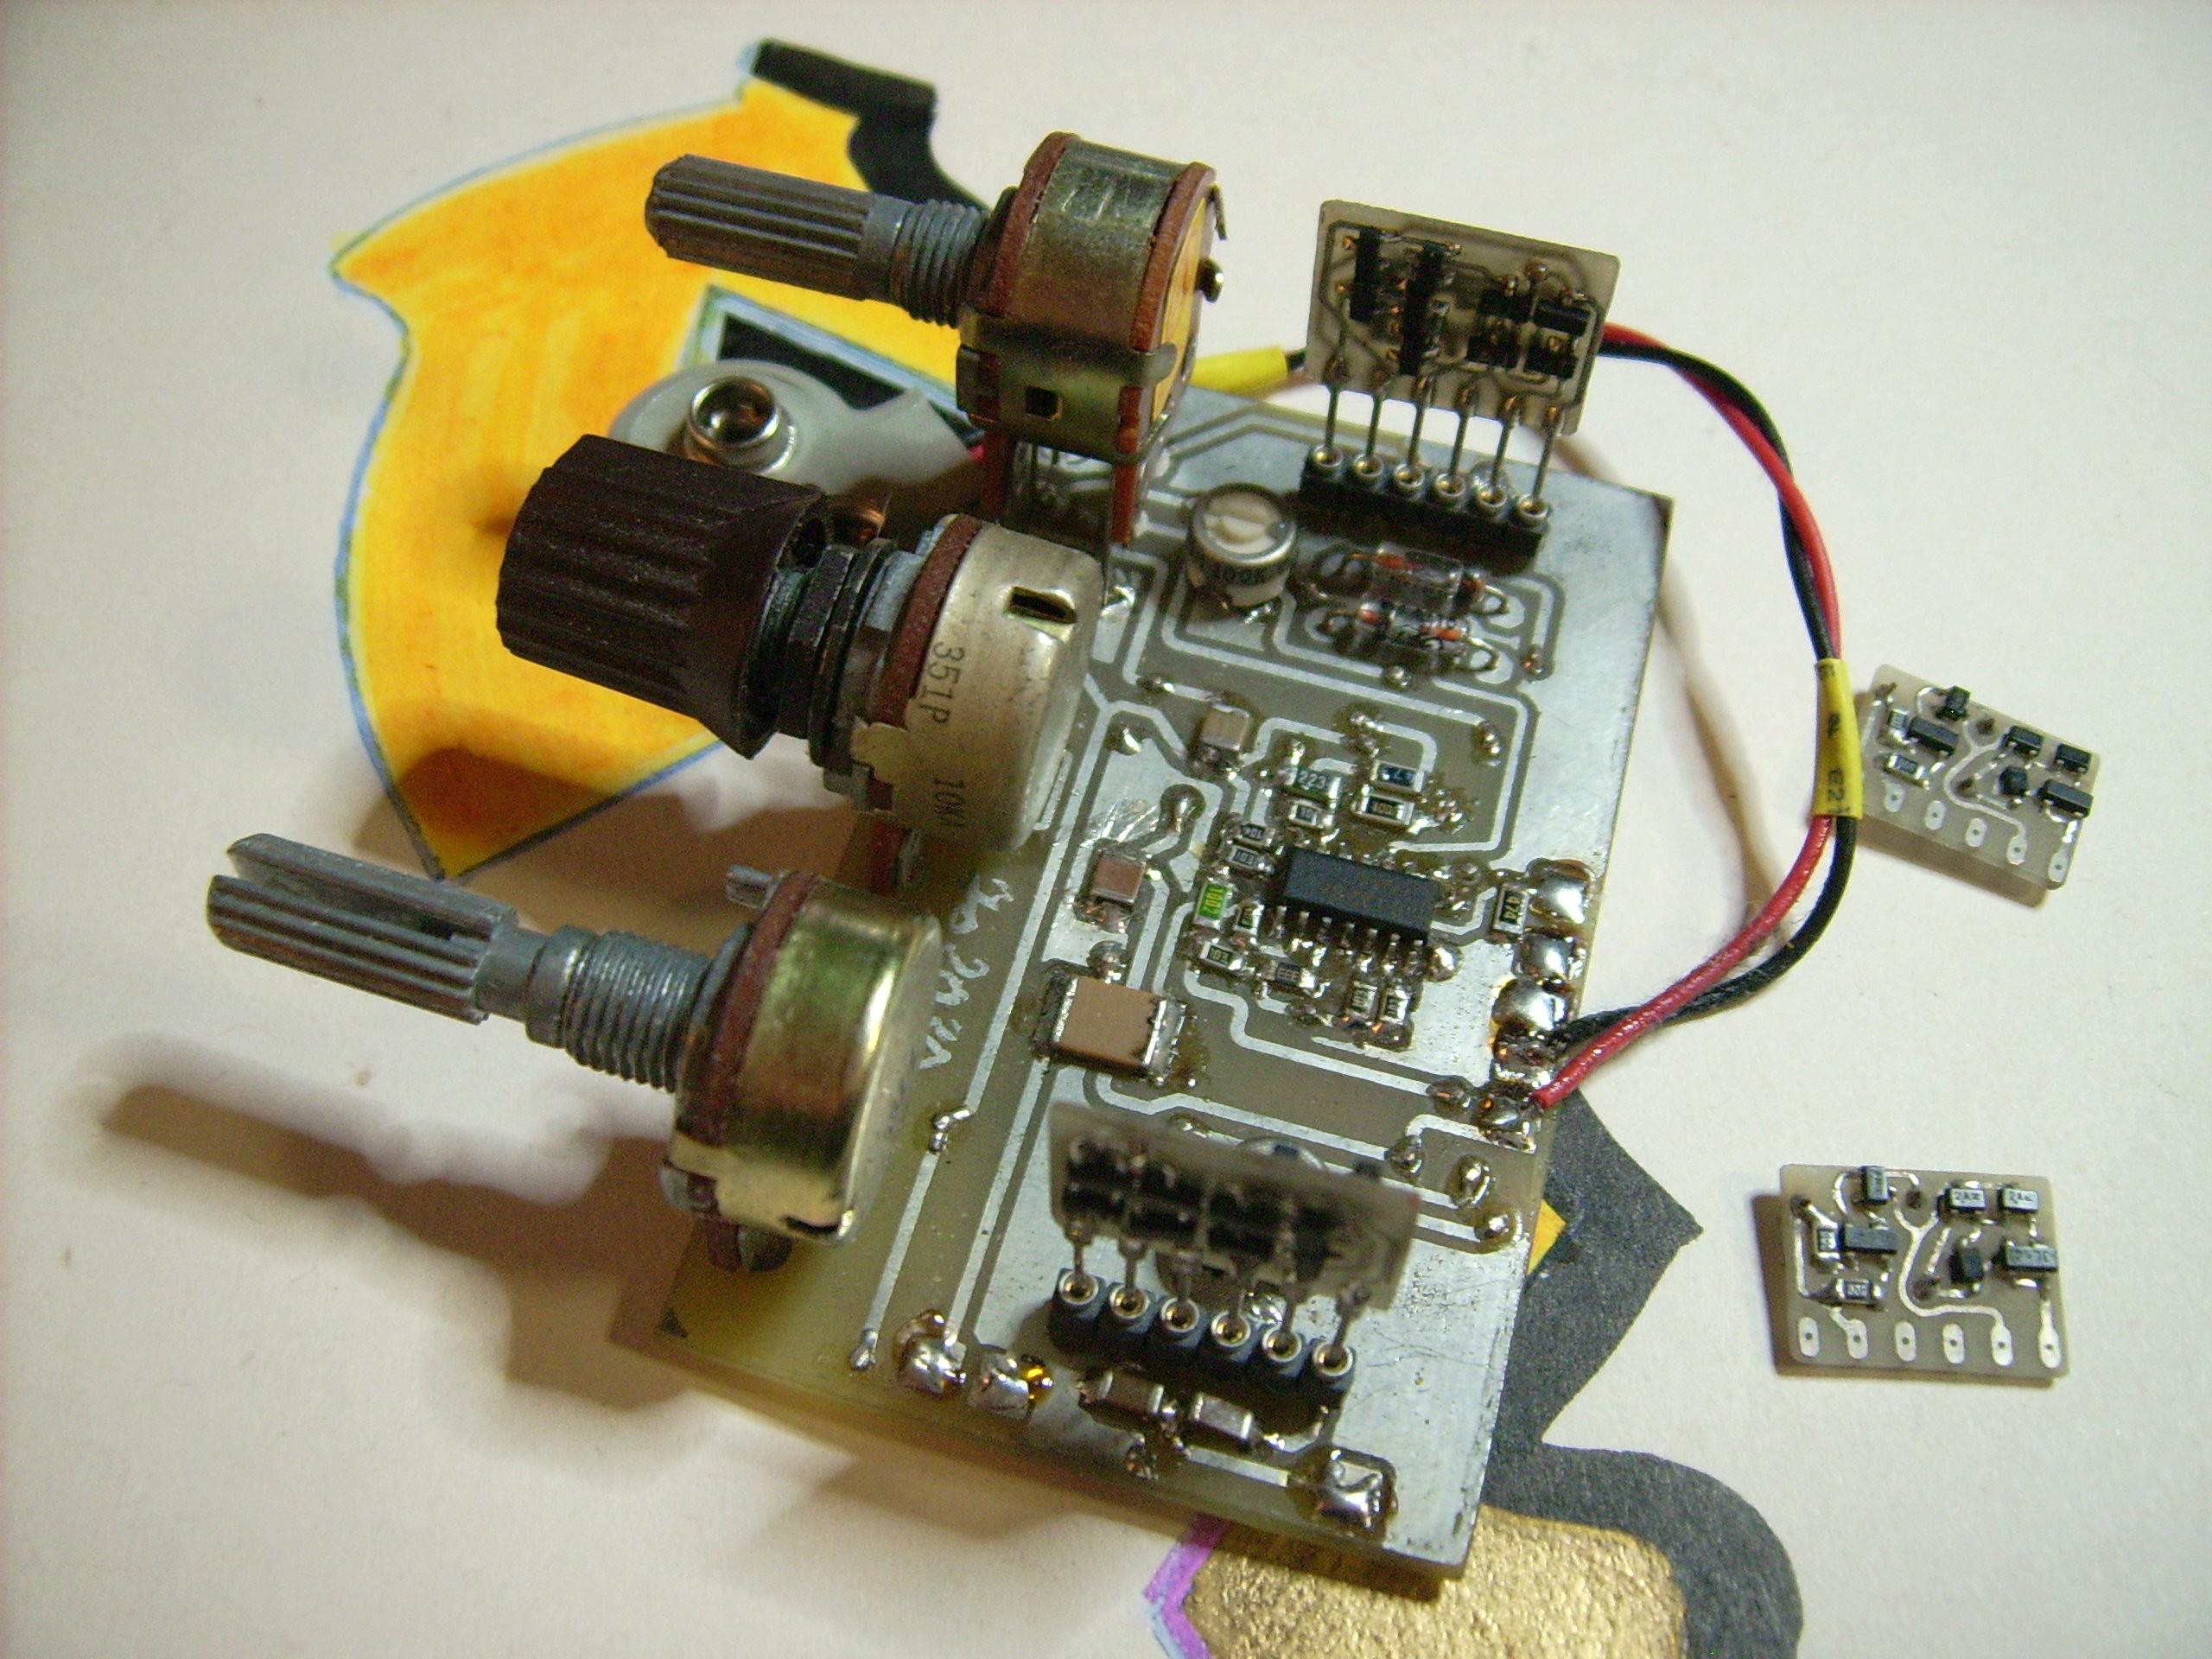 Ota Overdrive With Genuine Germanium Sound 130311 I Elektor Labs My Jfet Quartz Oscillator Public Circuit Online Simulator Magazine